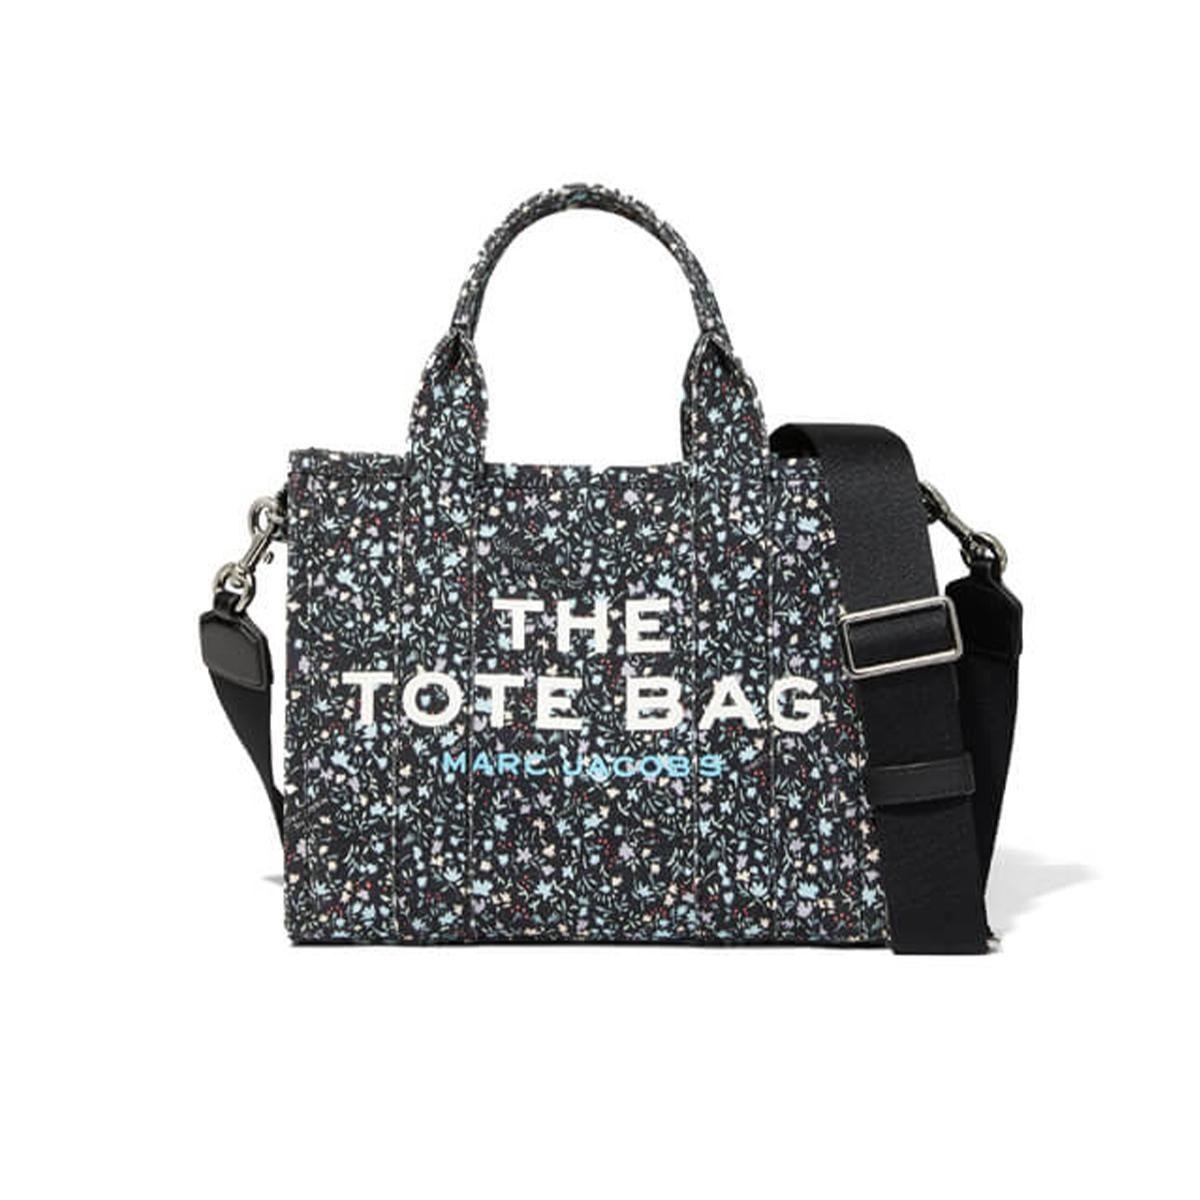 The Ditsy Floral Mini Traveler Tote Bag